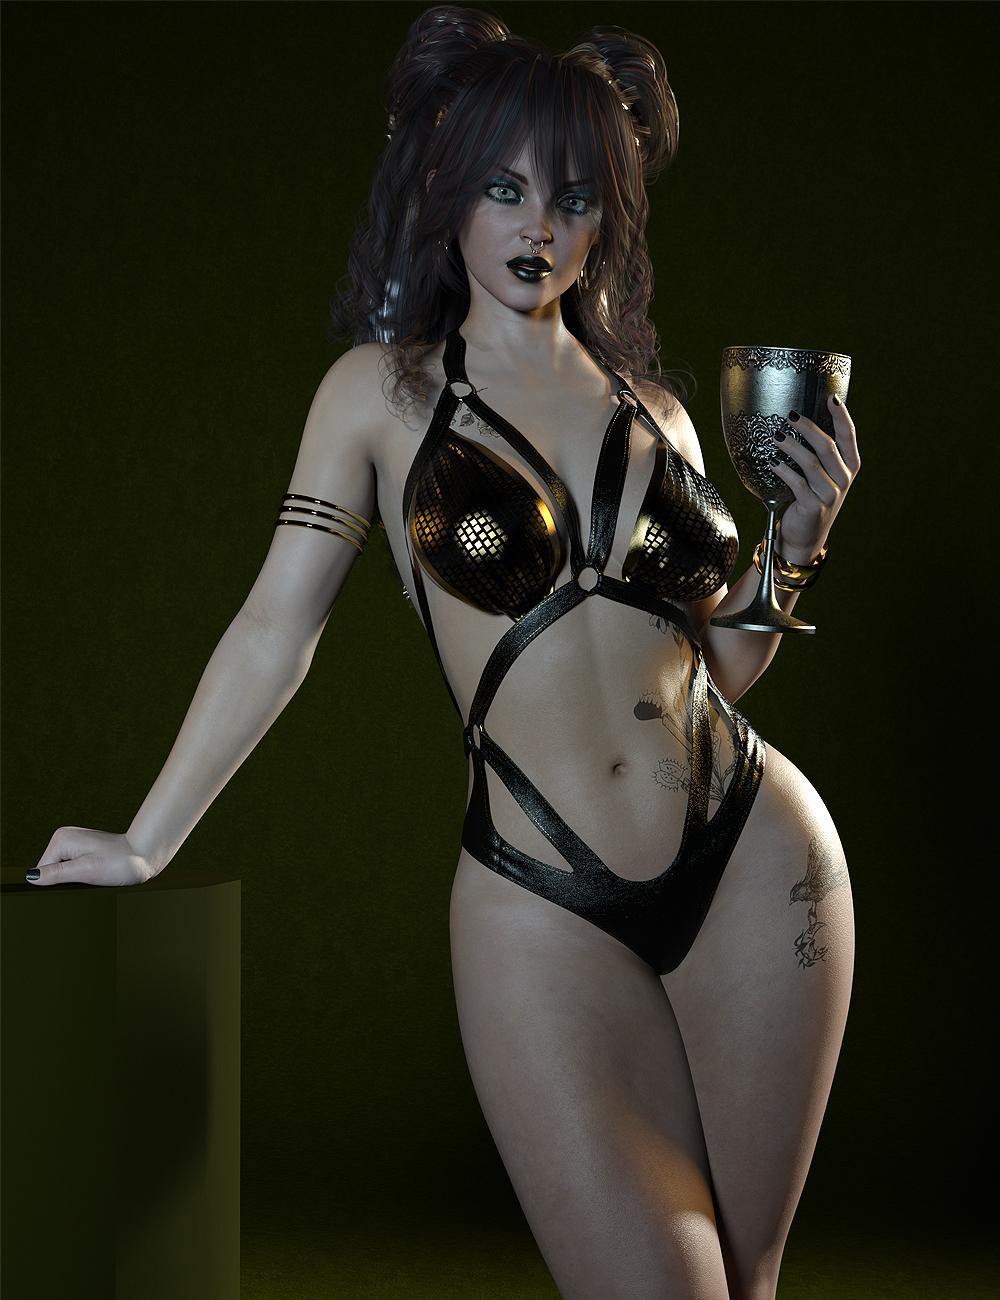 MR Scarlet for Genesis 8.1 Female by: Marcius, 3D Models by Daz 3D